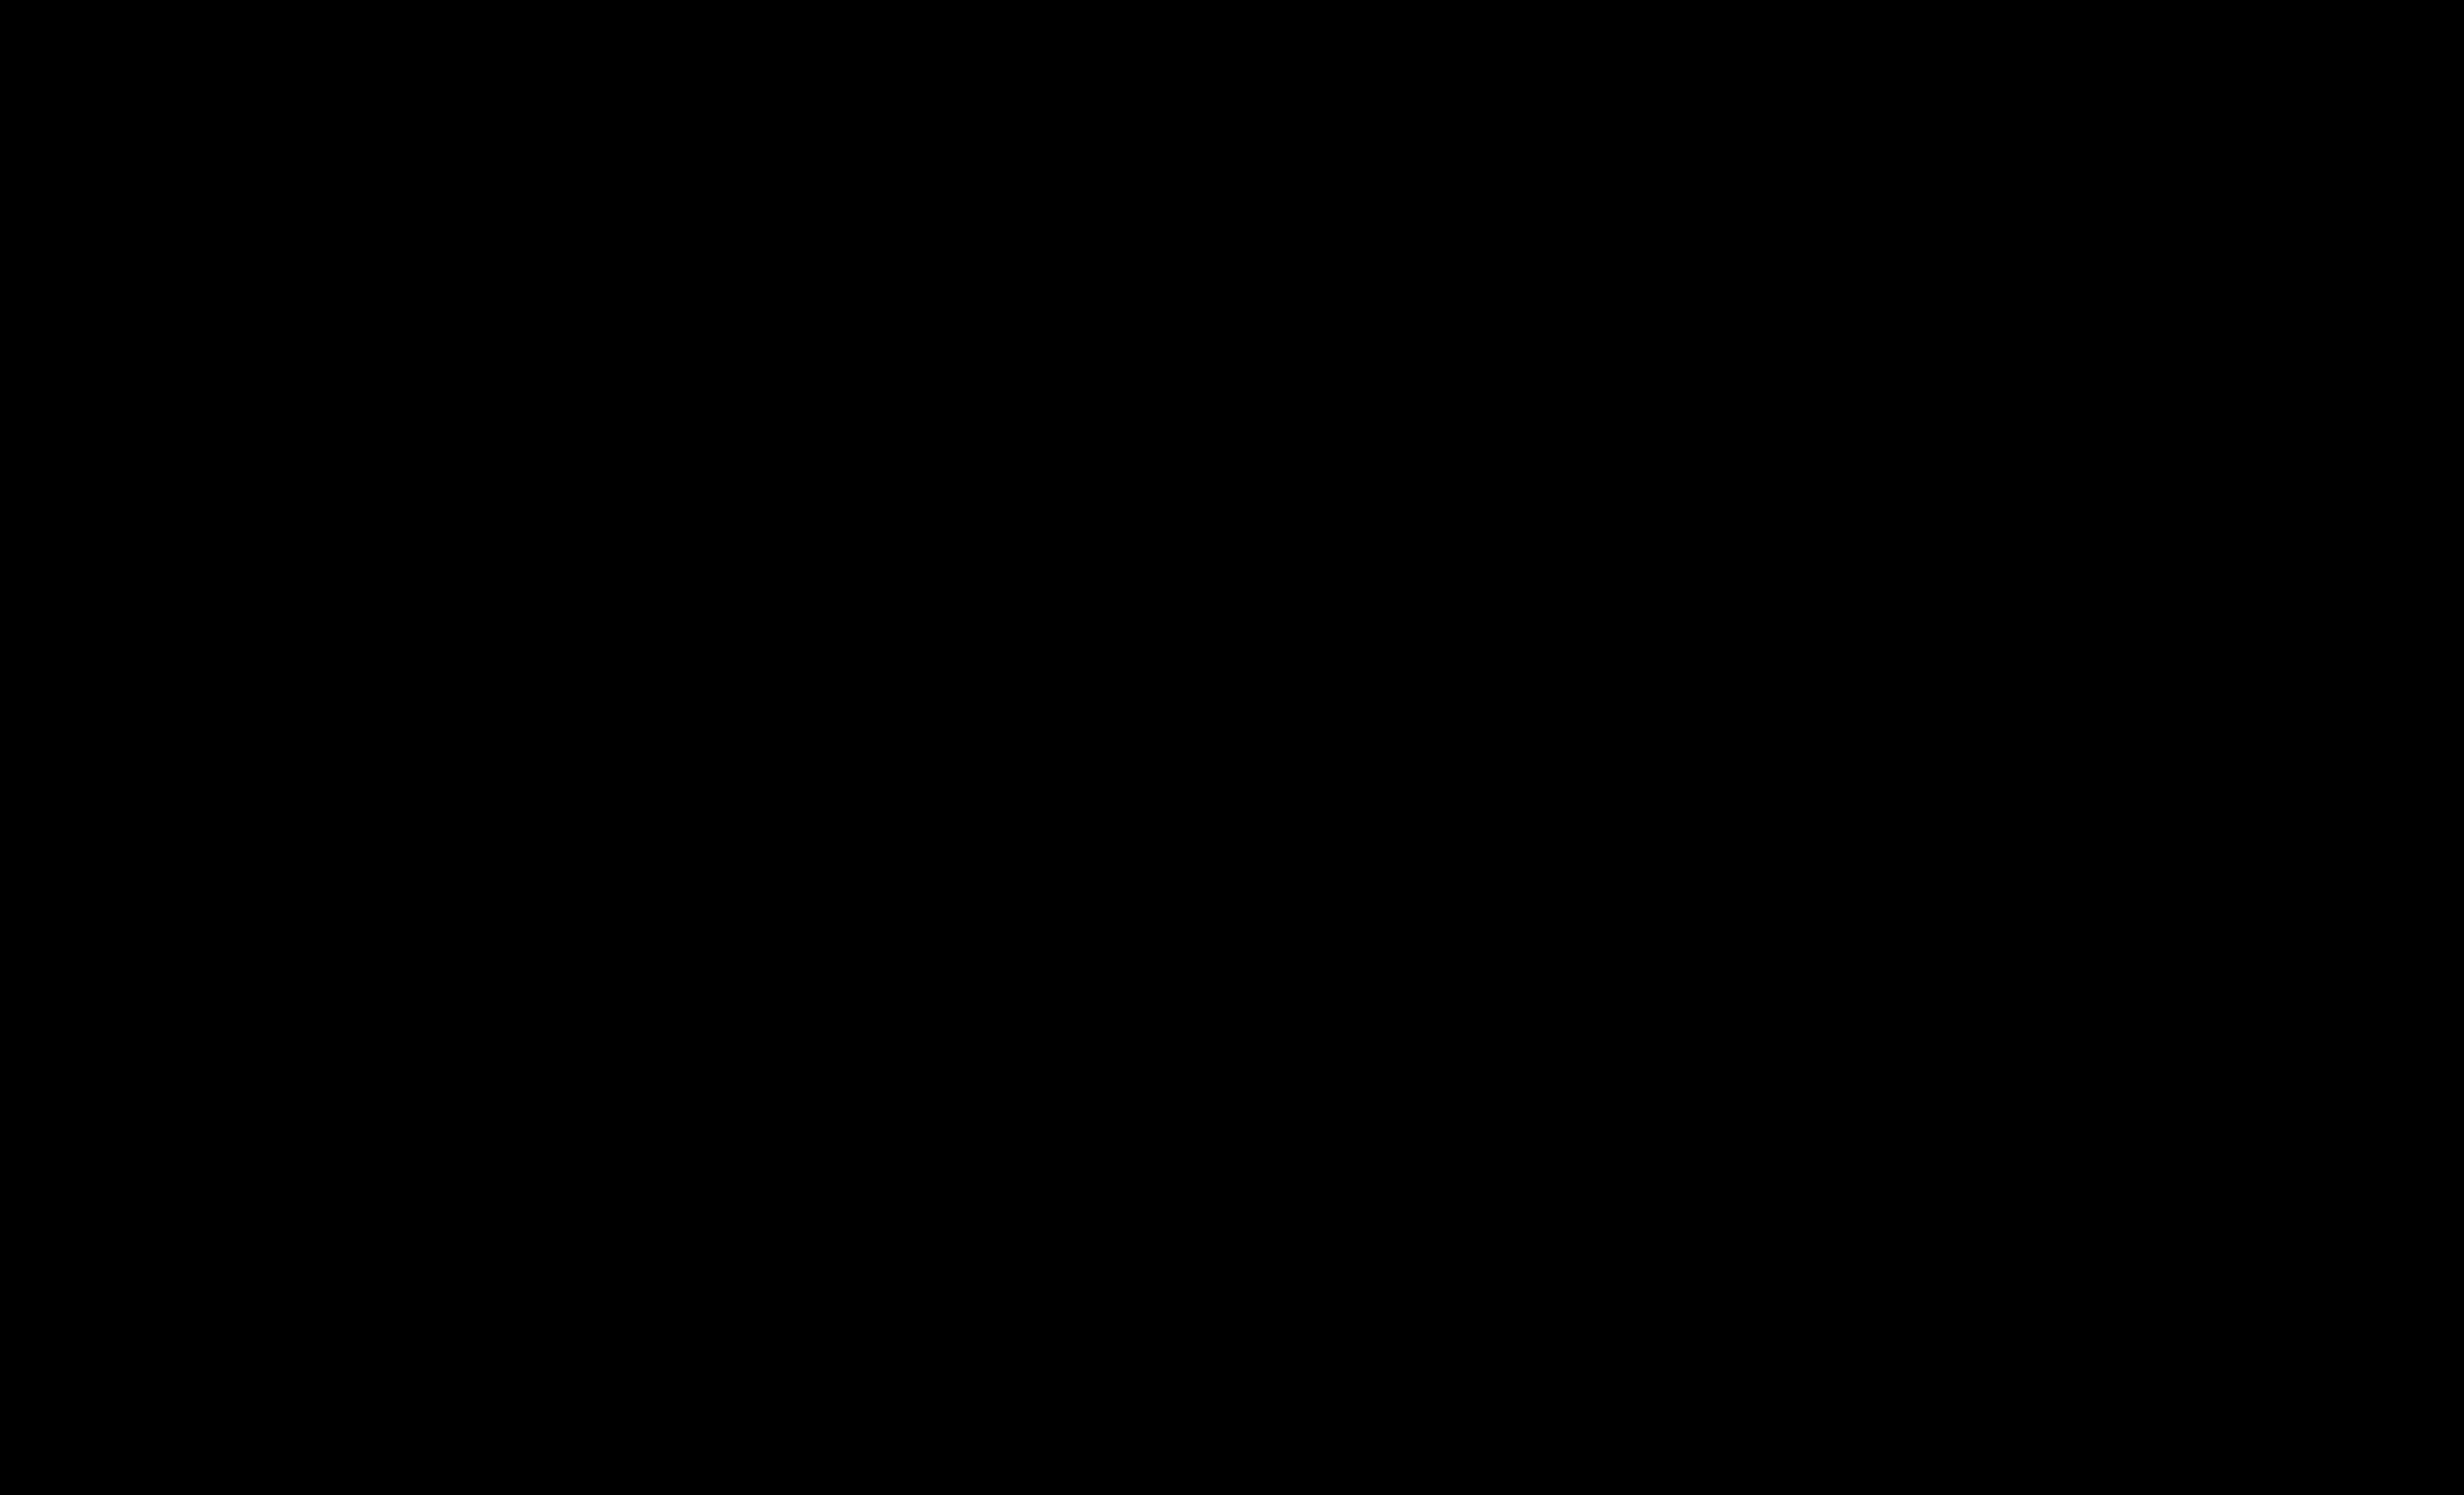 Logo+Icon-01.png